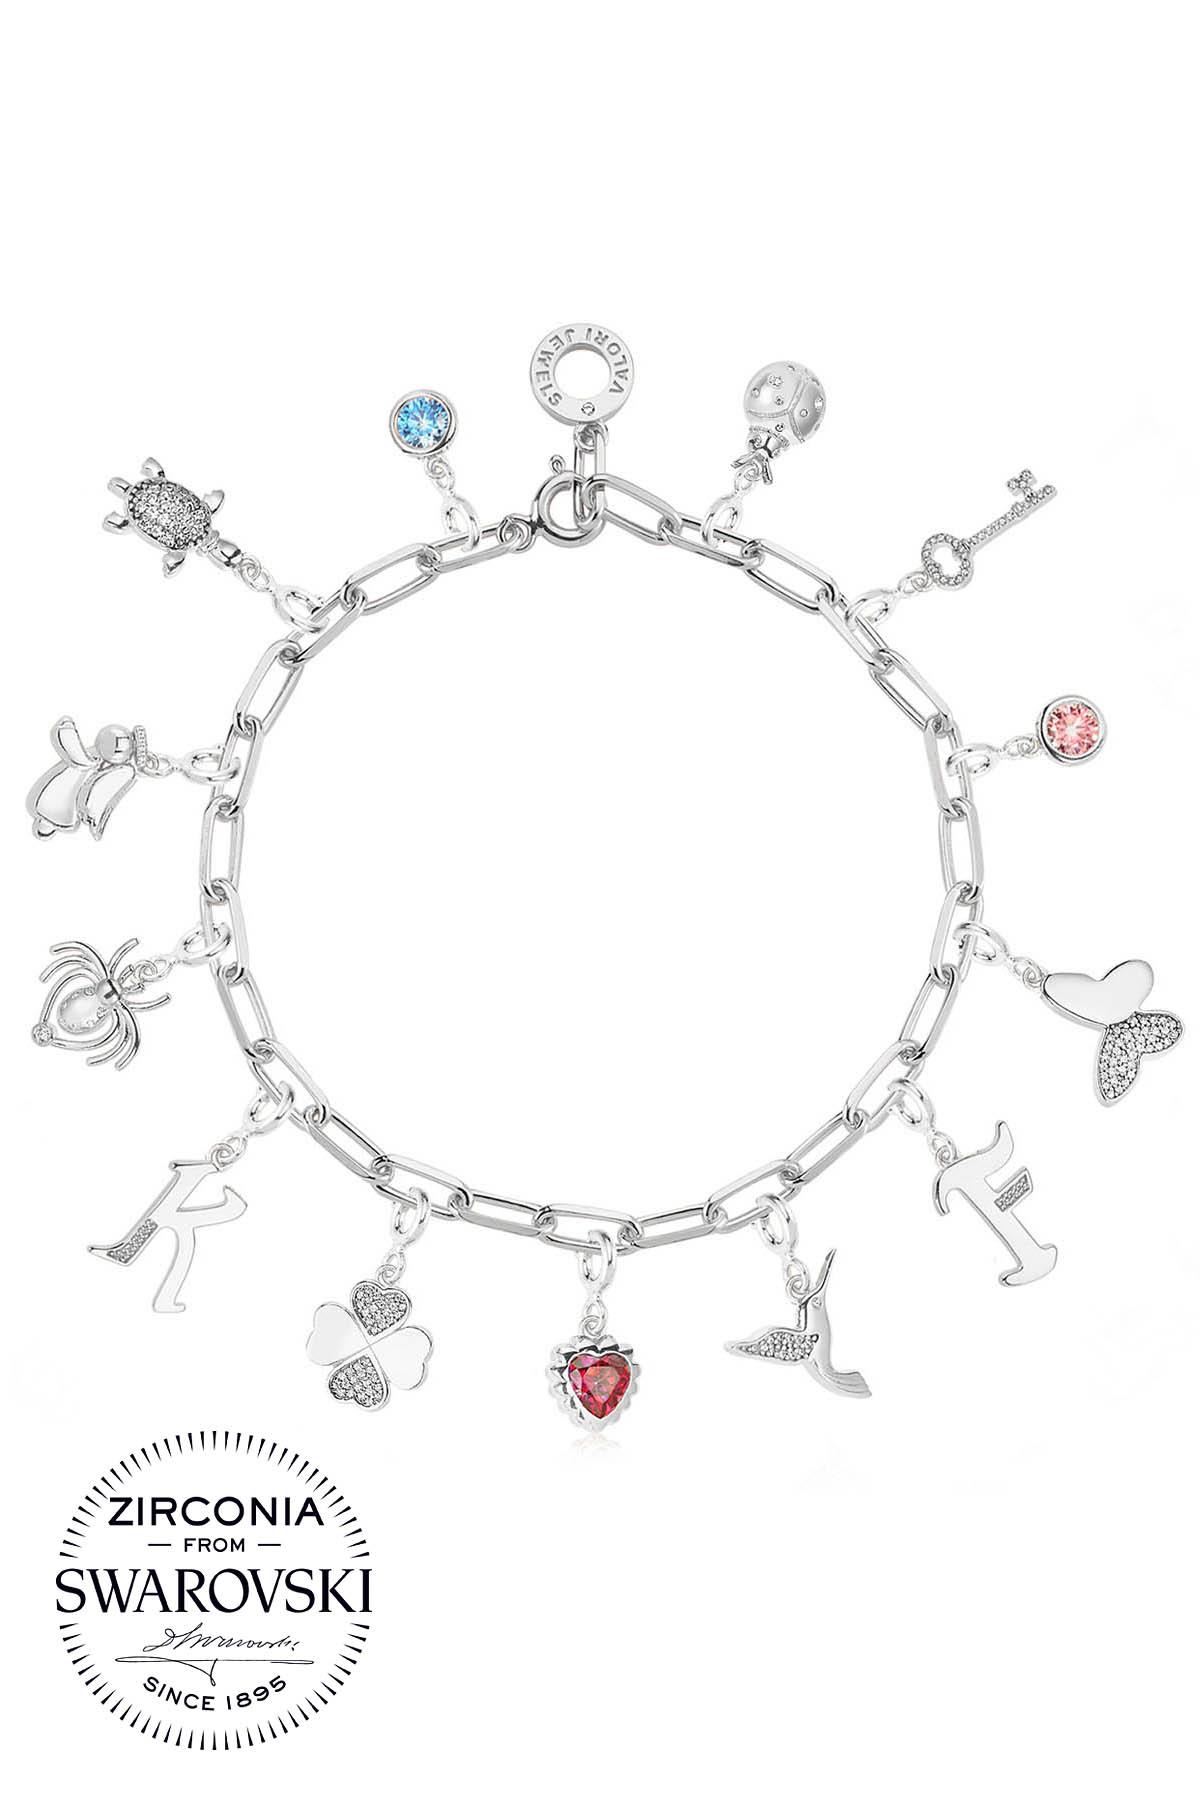 Assorted Symbols, Swarovski Zirconia Gemstone, Rhodium Plated, Sterling  Silver Charm Bracelet - STCHBL005